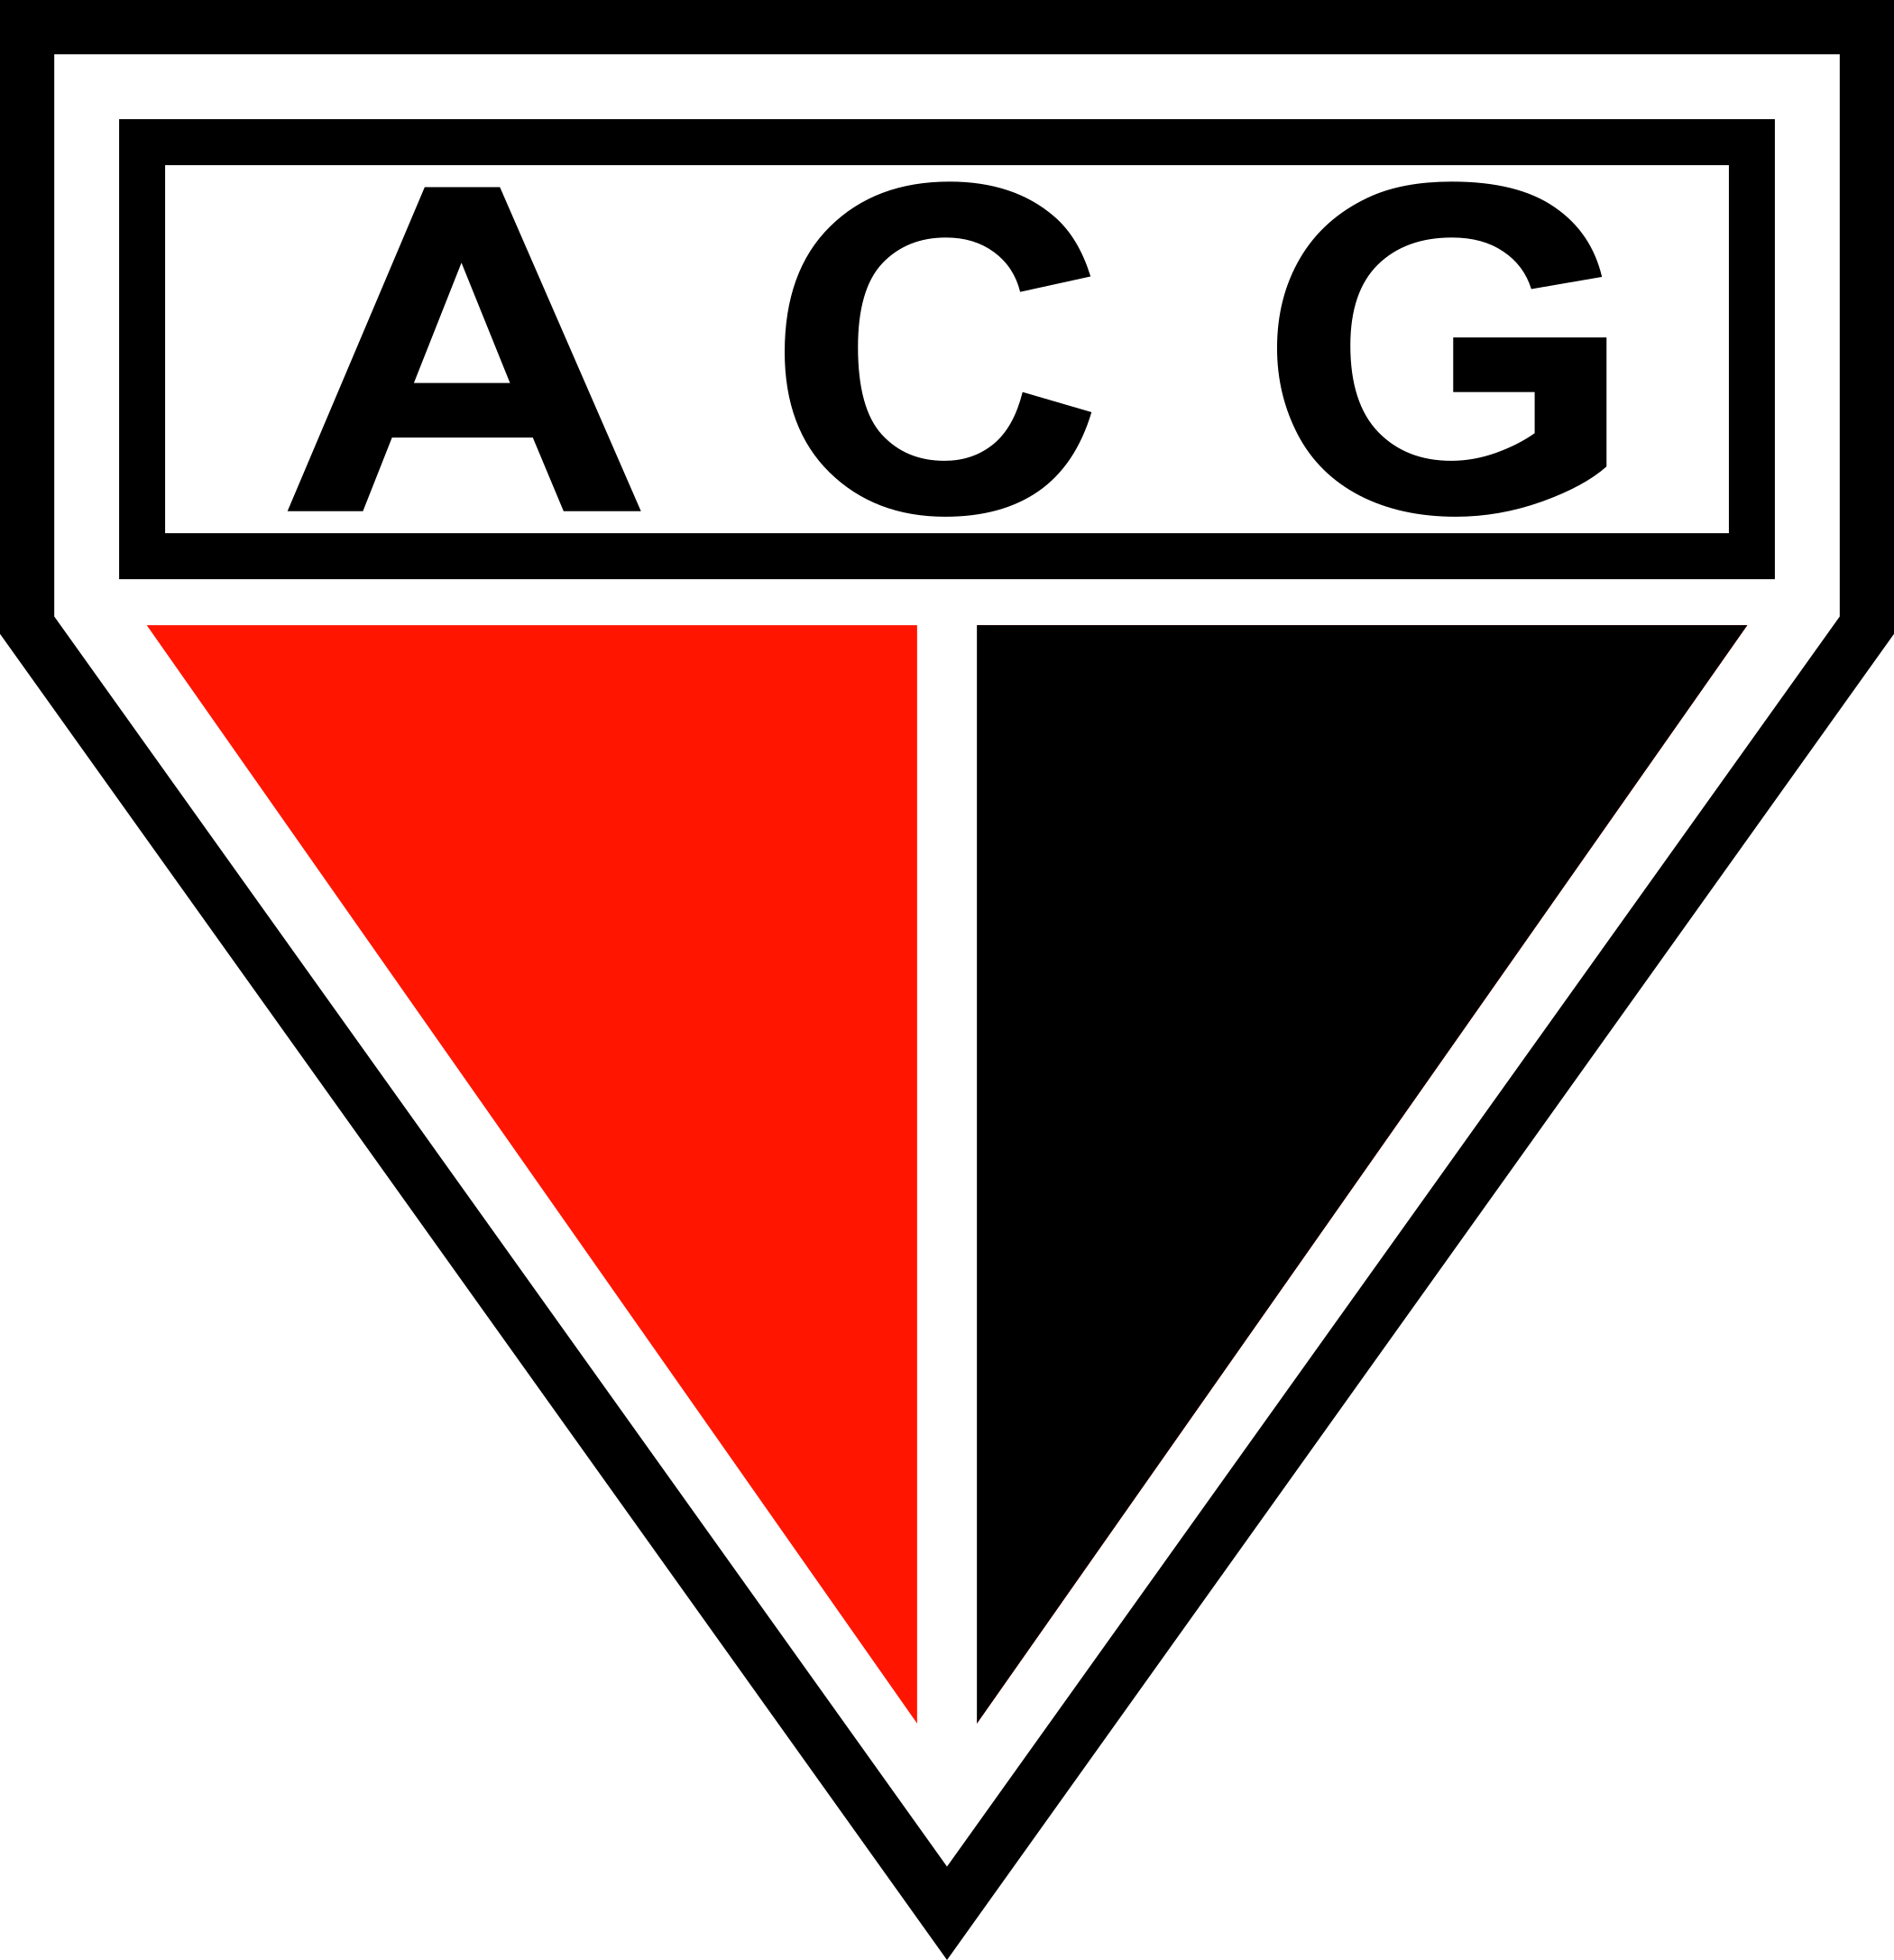 atletico go logo escudo 1 - Atlético Goianiense Logo